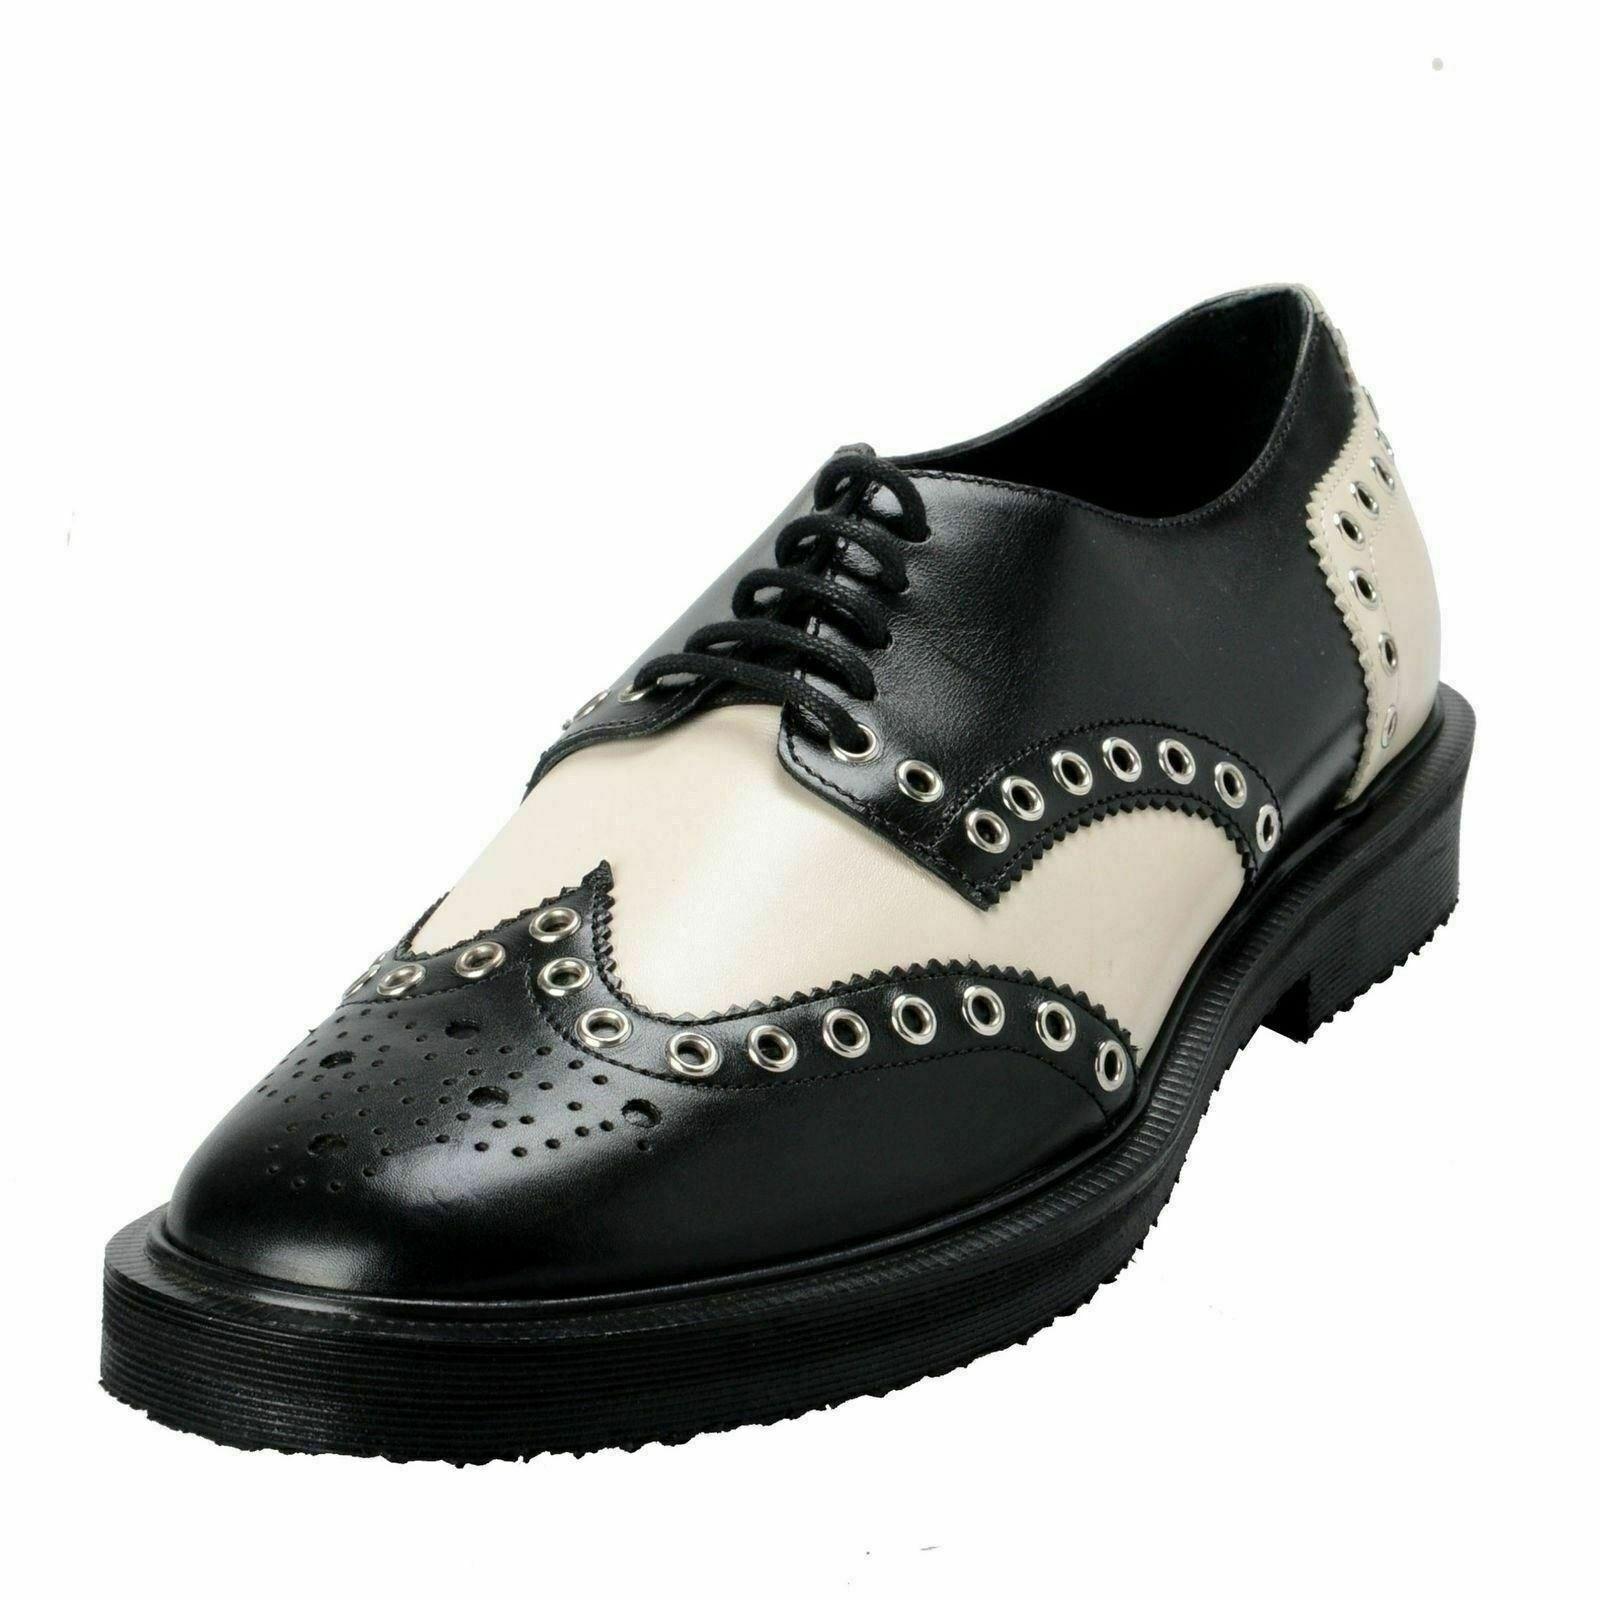 Giuseppe Zanotti Mens Bicolor Leather Lace Up shoes Oxford USA 9 en 42